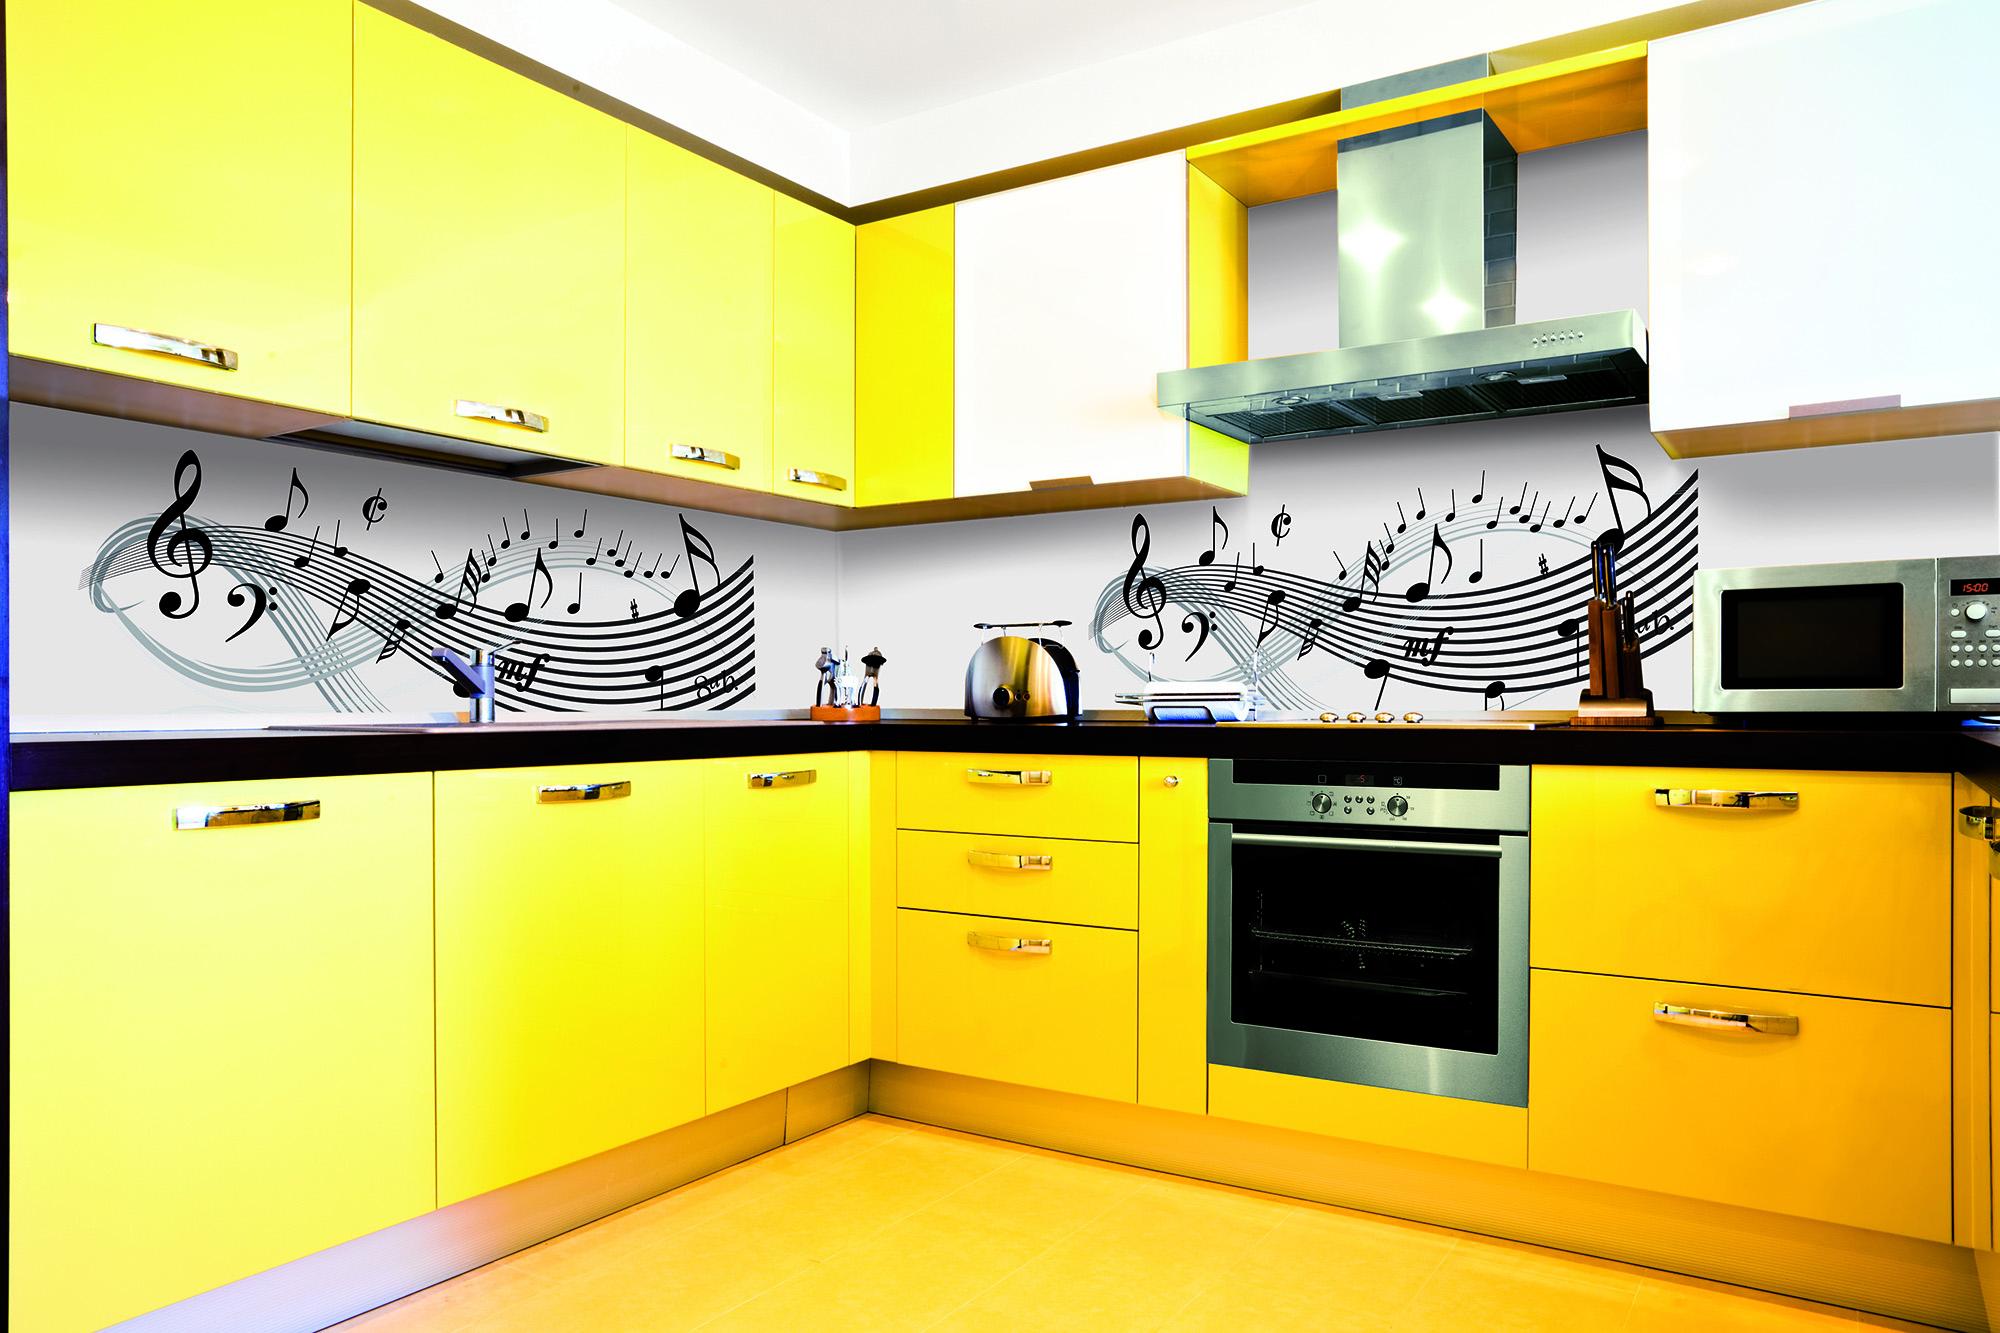 Желтая кухня с черно-белым фартуком